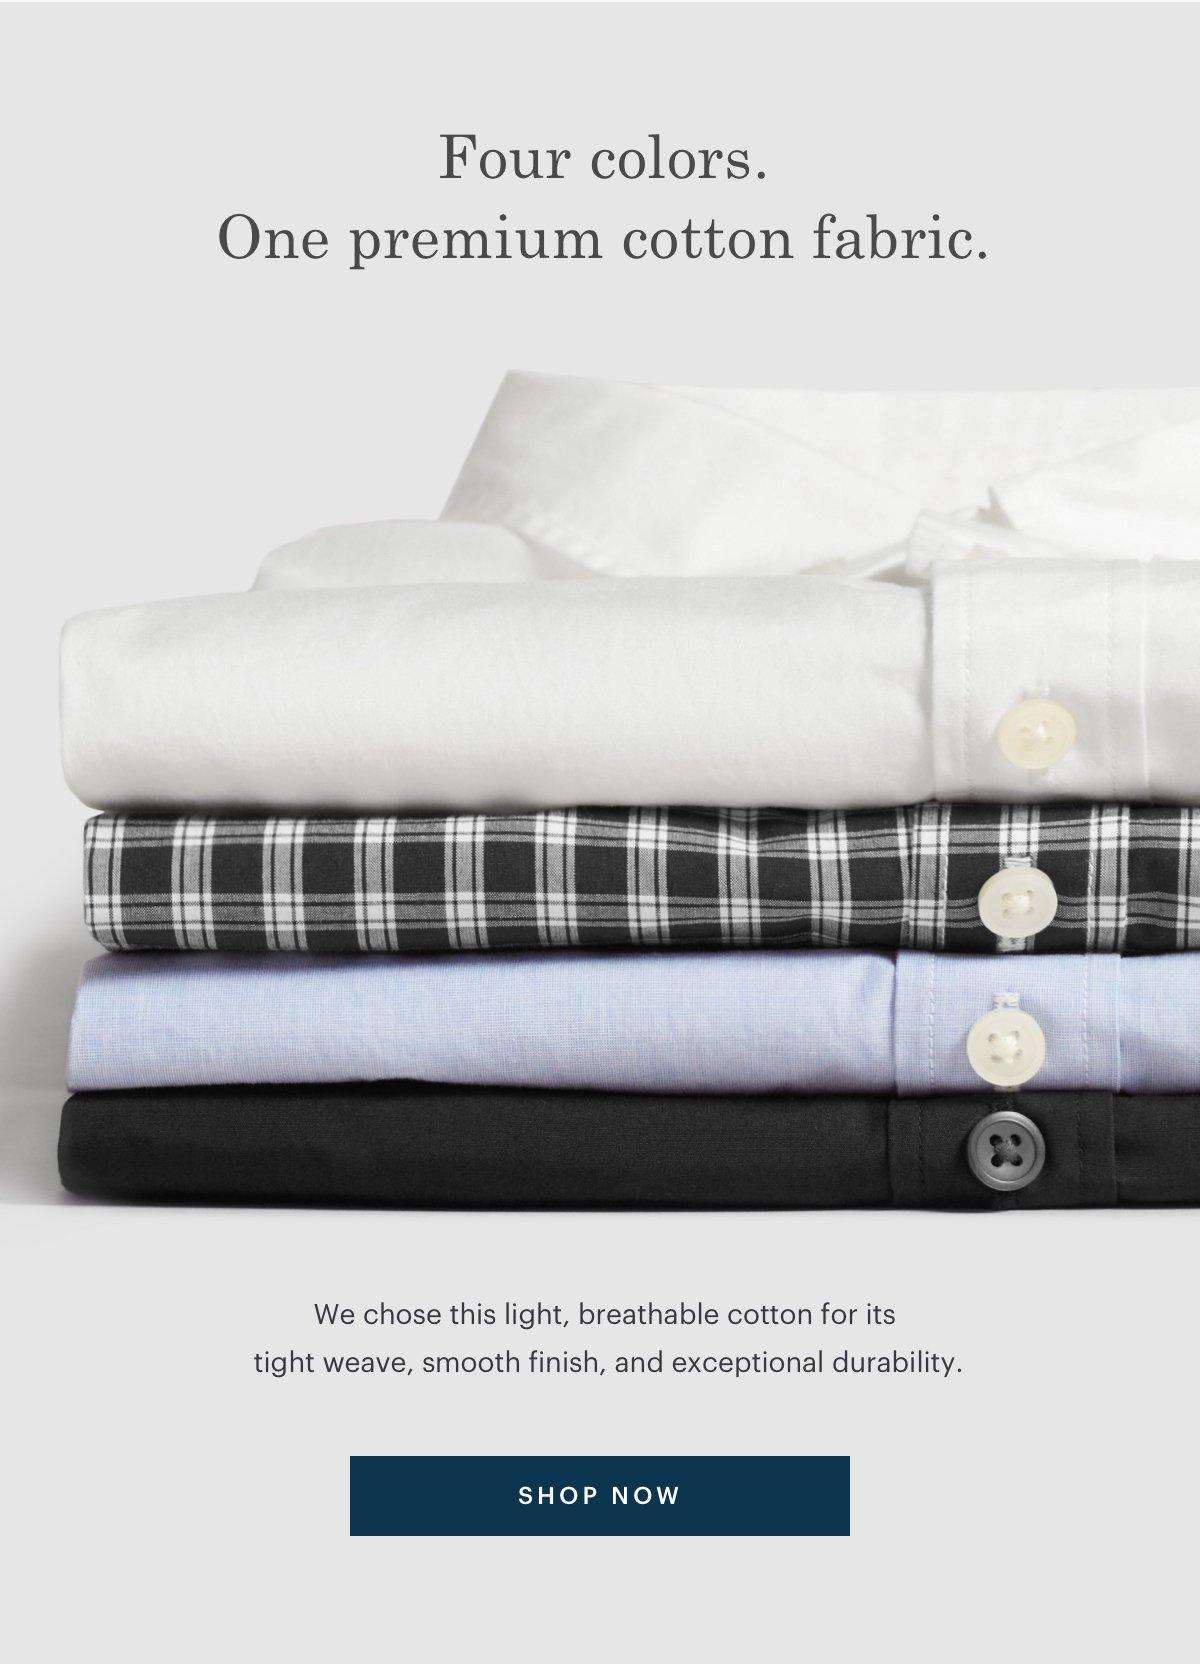 Four colors. One premium cotton fabric.